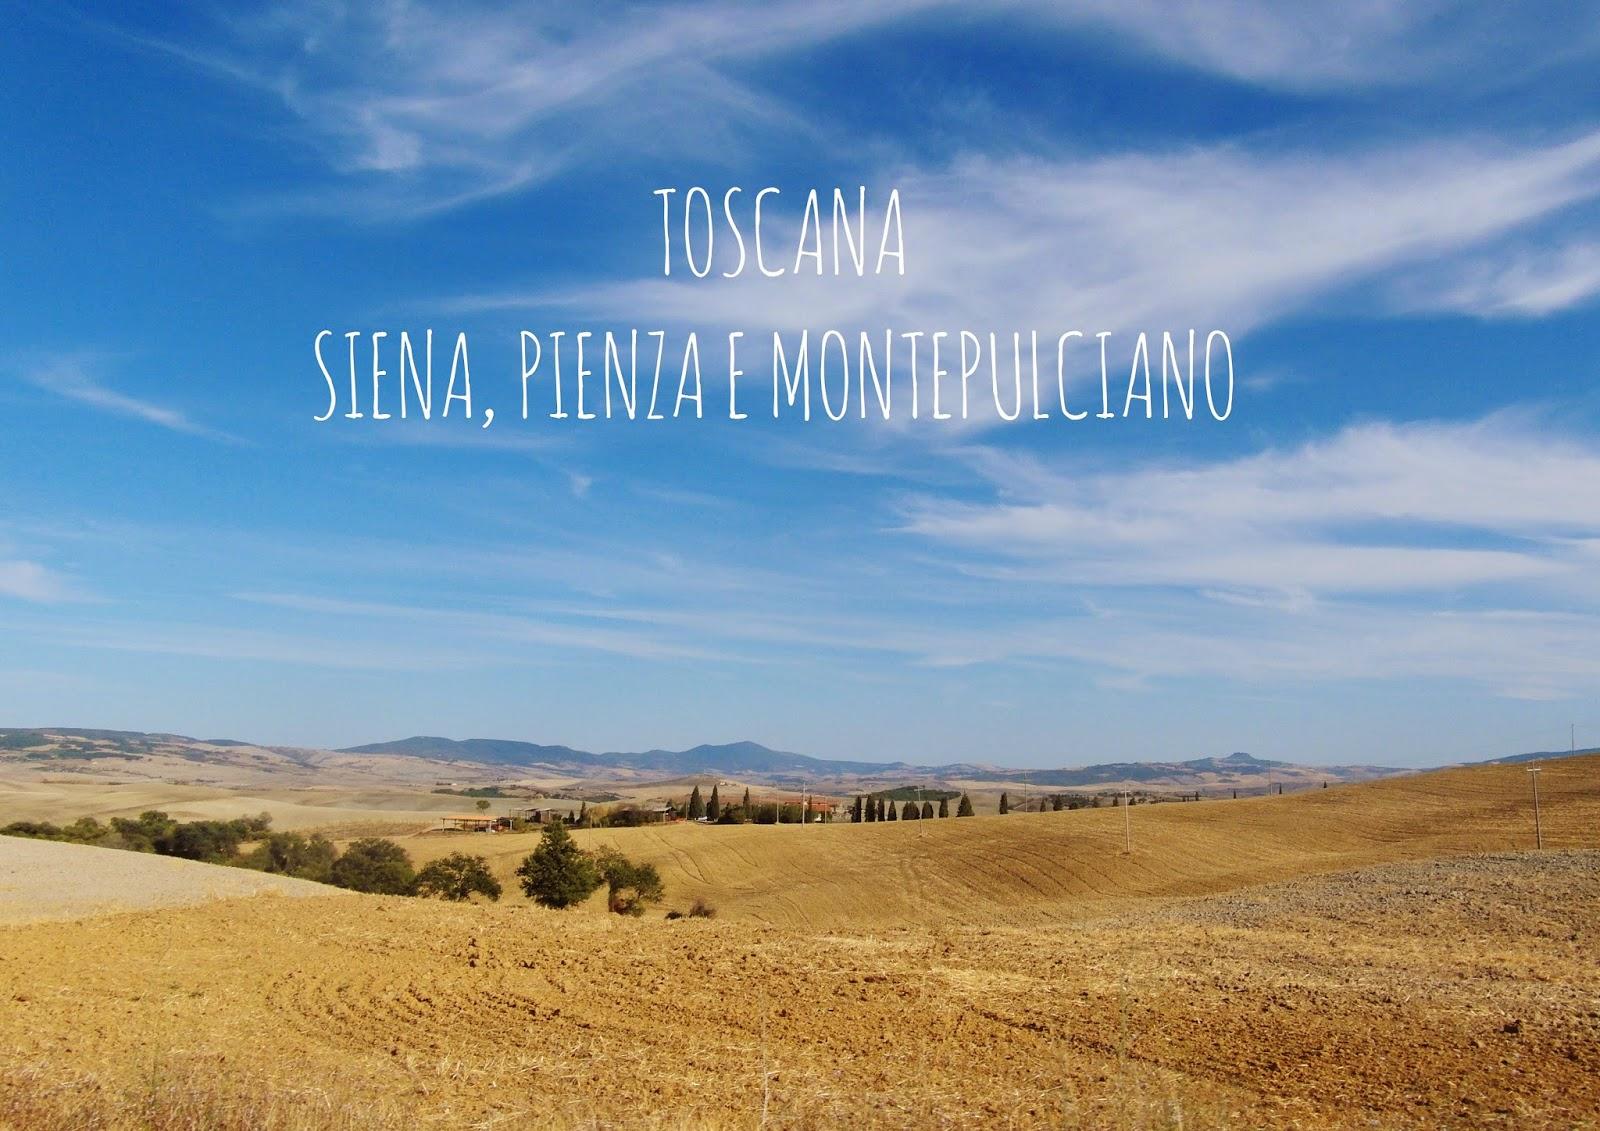 http://scentedlittlepleasures.blogspot.it/2014/07/siena-pienza-e-montepulciano-nuova.html